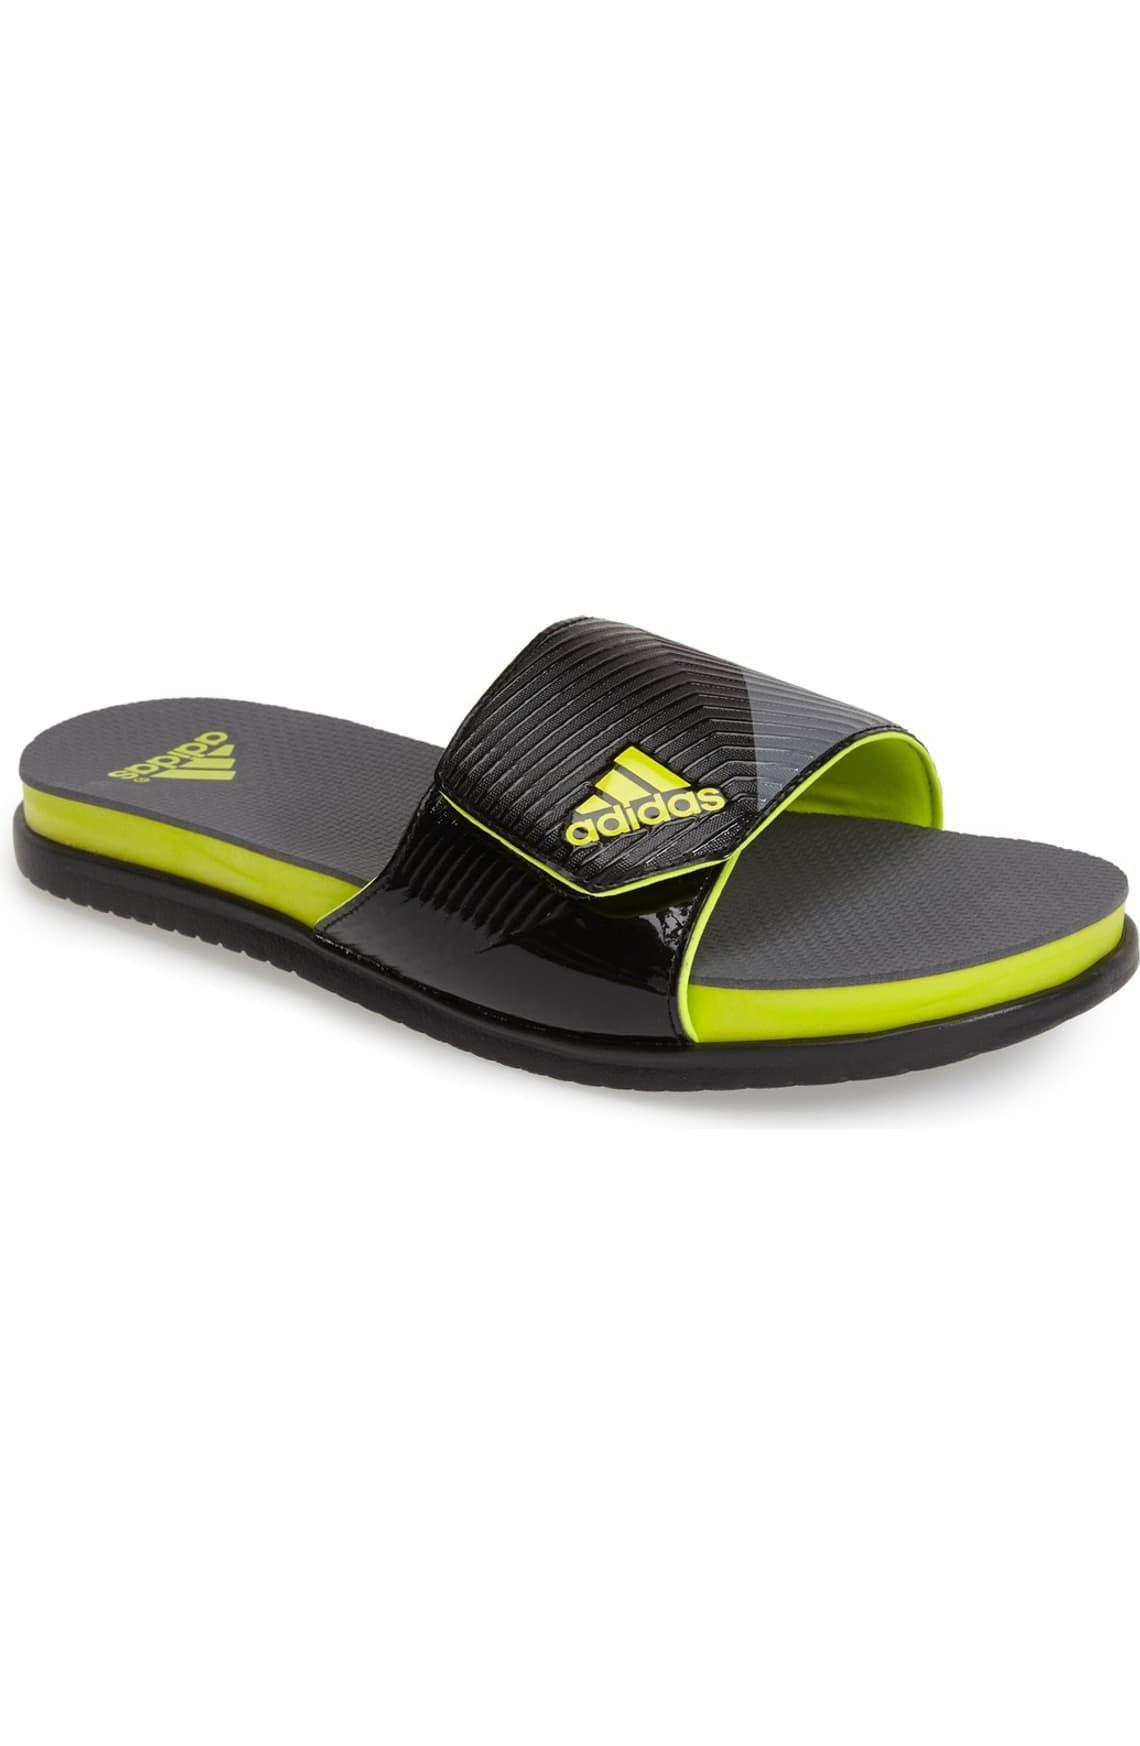 riñones tirar a la basura Planeta  adidas 'Supercloud Plus' Slide Sandal (Men) | Nordstrom in 2020 | Mens  sandals, Sandals, Mens fashion shoes